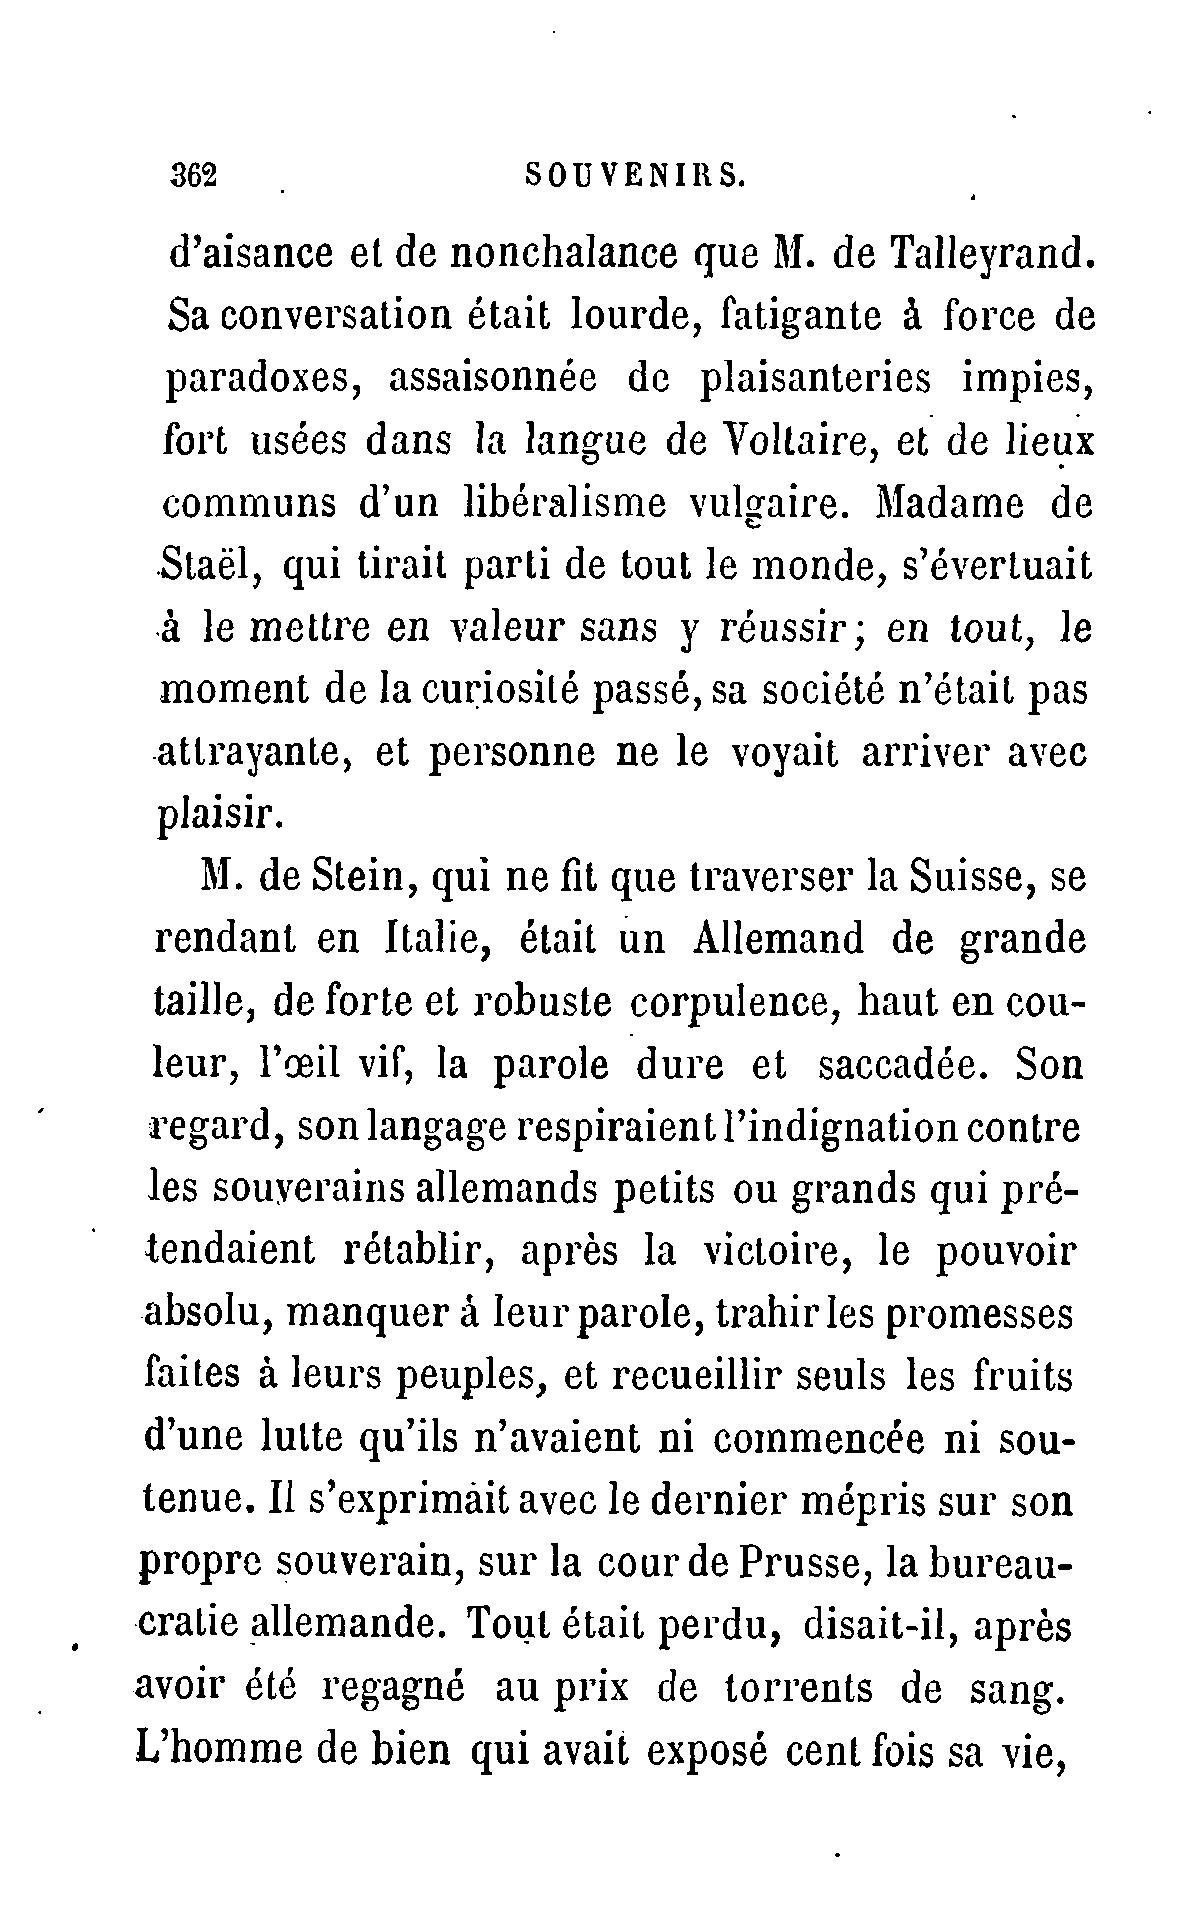 page broglie souvenirs 1785 wikisource. Black Bedroom Furniture Sets. Home Design Ideas